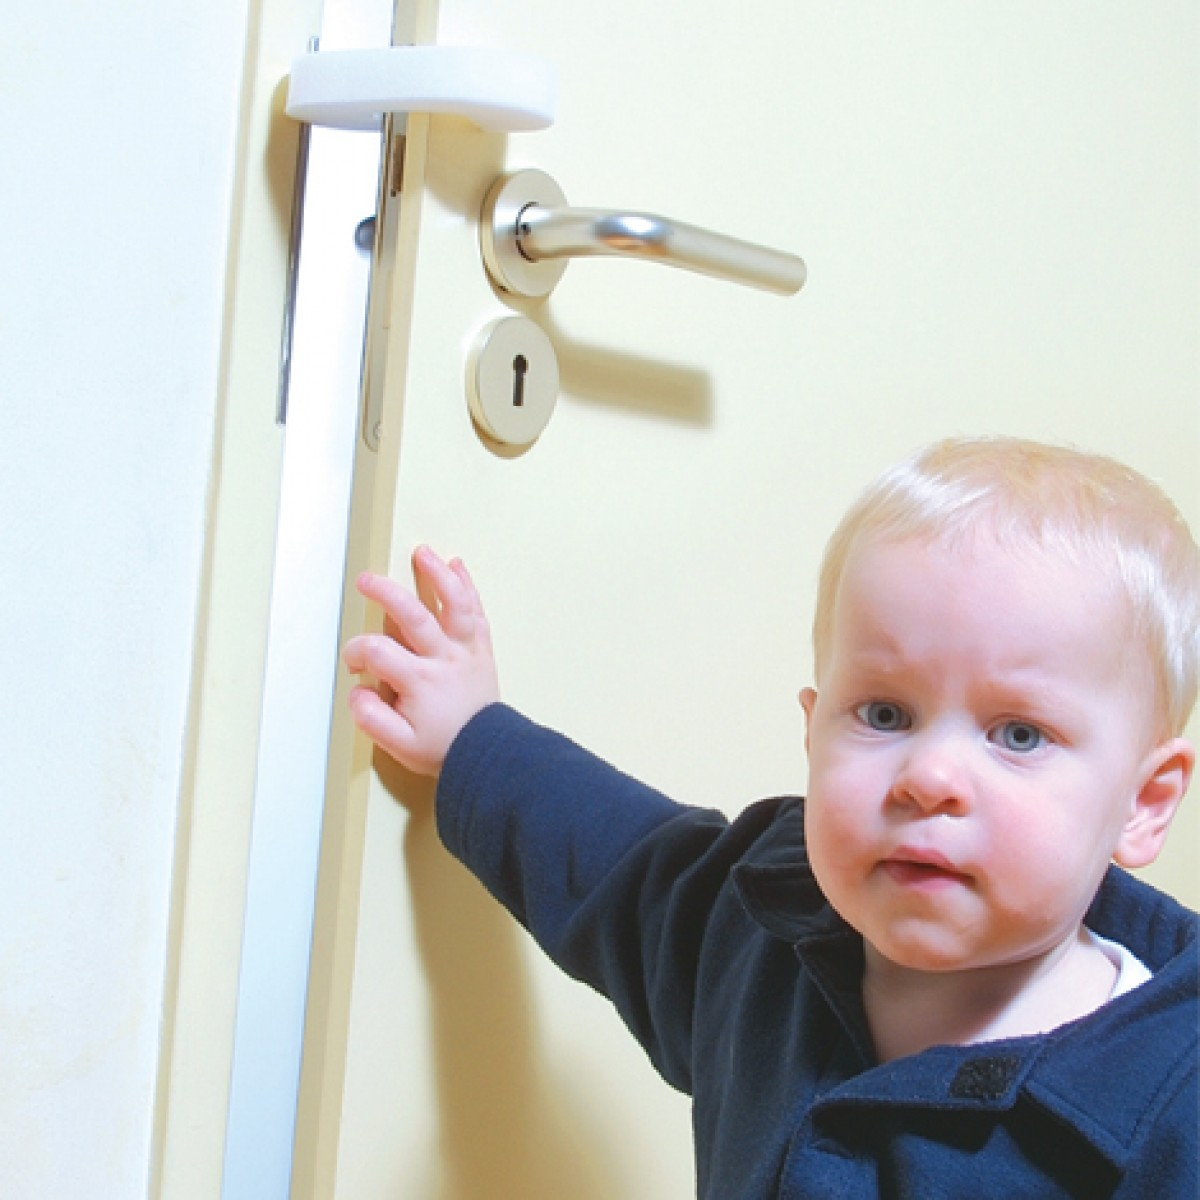 Фото безопасности жизни детей